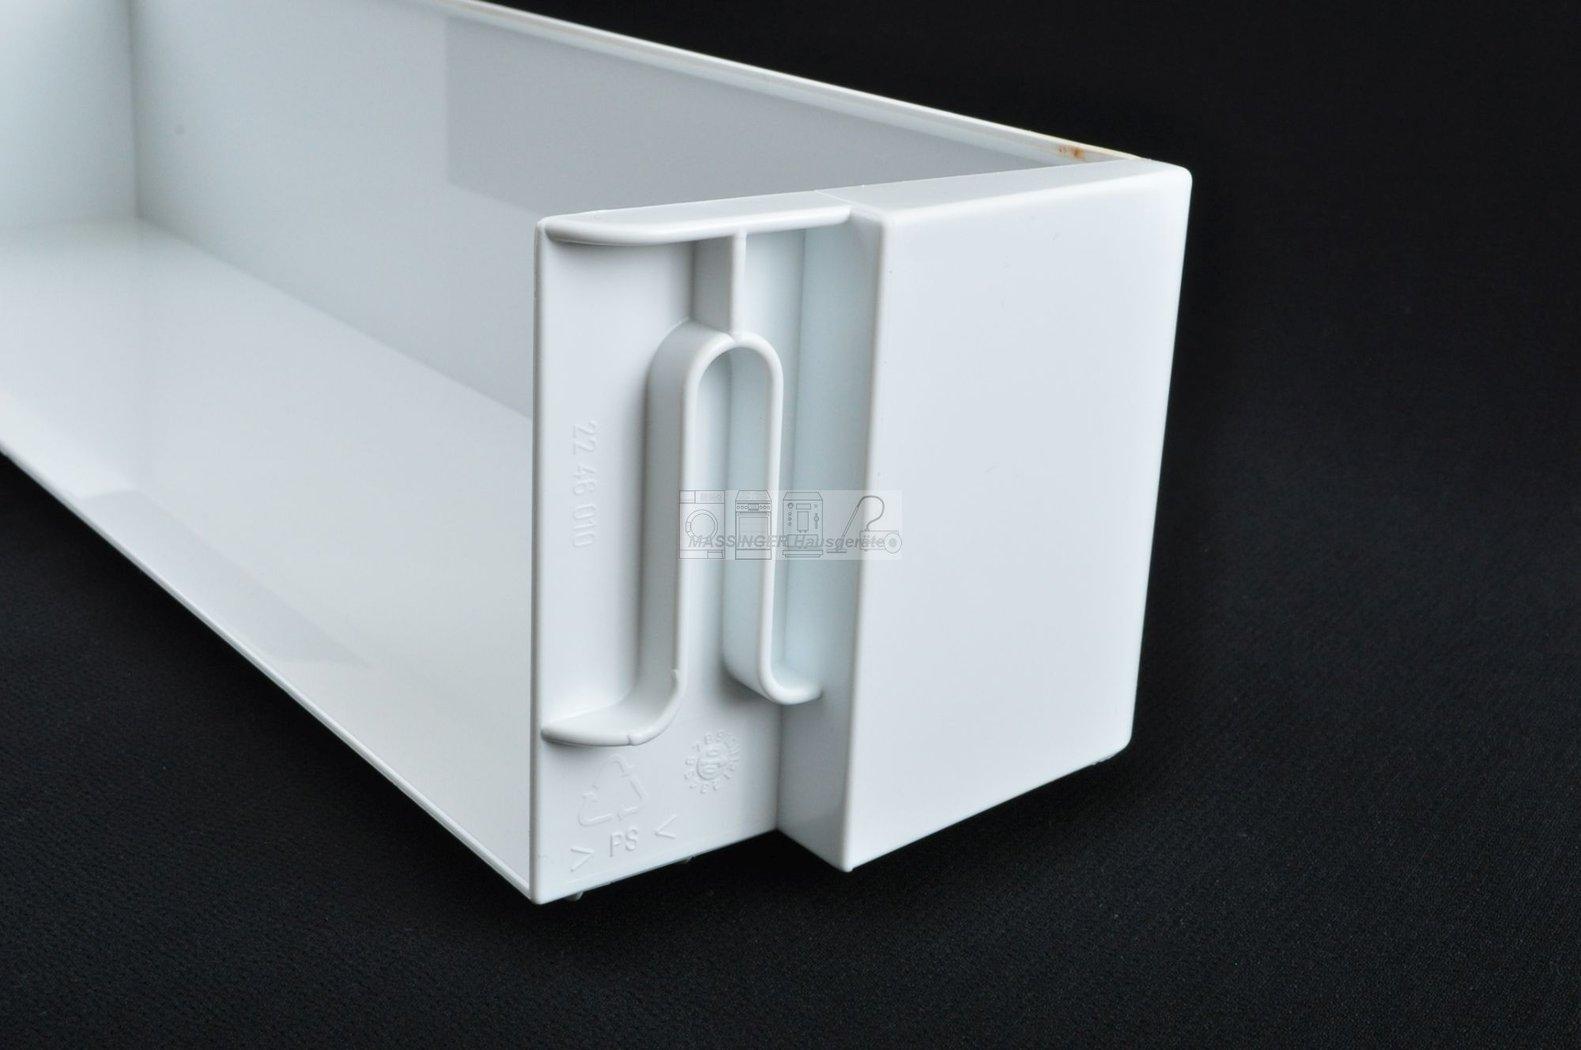 Aeg Kühlschrank Santo öko : Flaschenfach absteller kühlschrank aeg santo cm